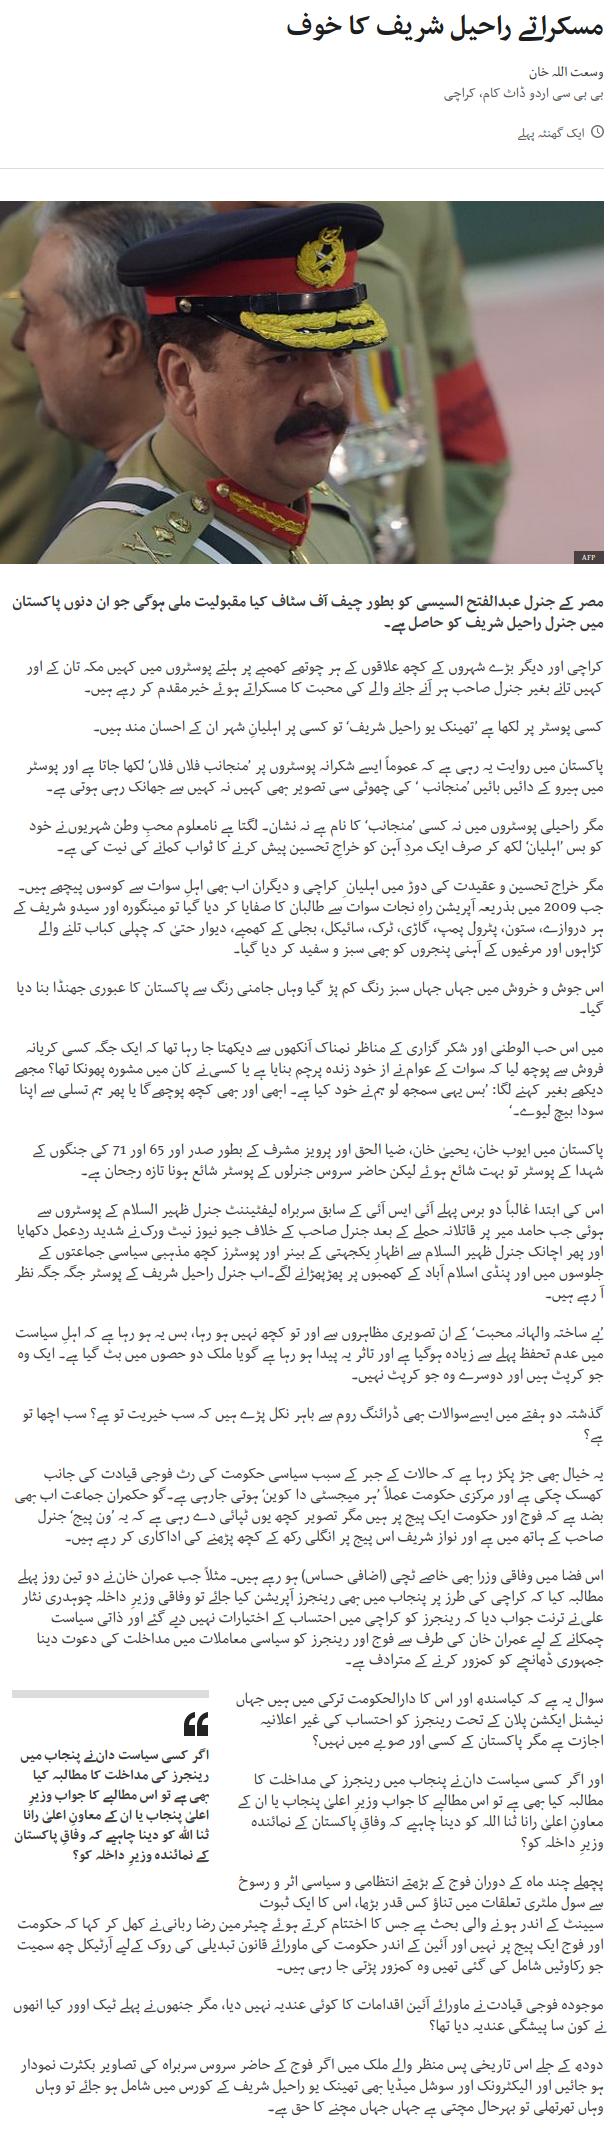 Wusatullah Khan Column | Muskurate Raheel Sharif Ka Khouf | Baat Say Baat